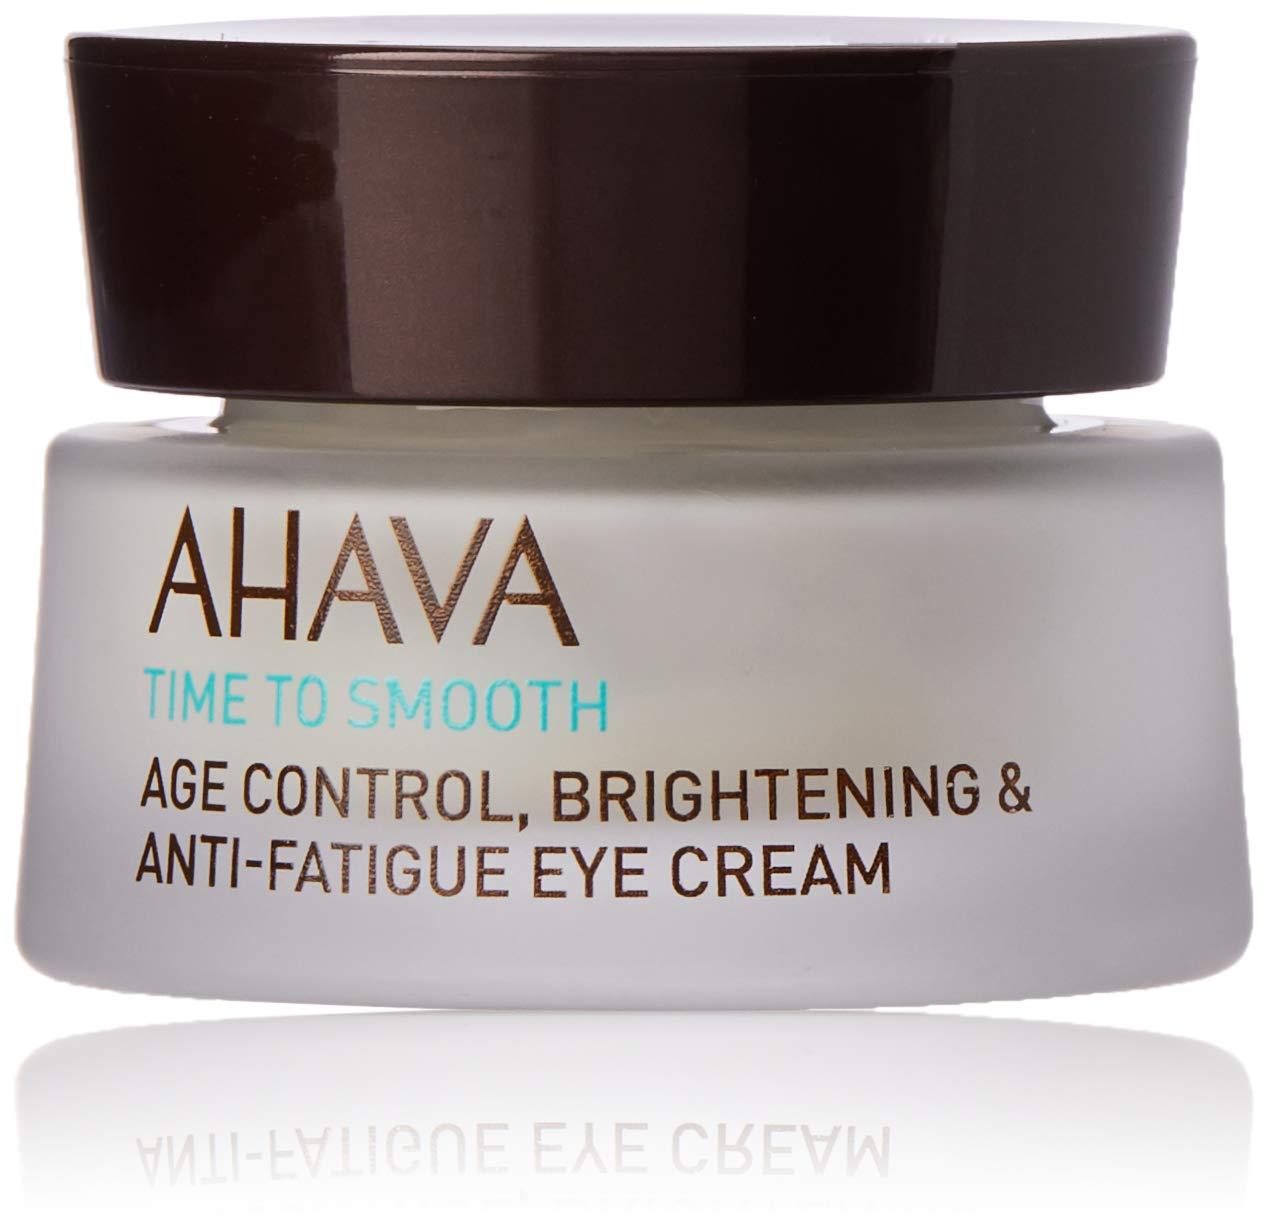 AHAVA Dead Sea Age Control Brightening Anti Fatigue Eye Cream, 0.51 Fl Oz